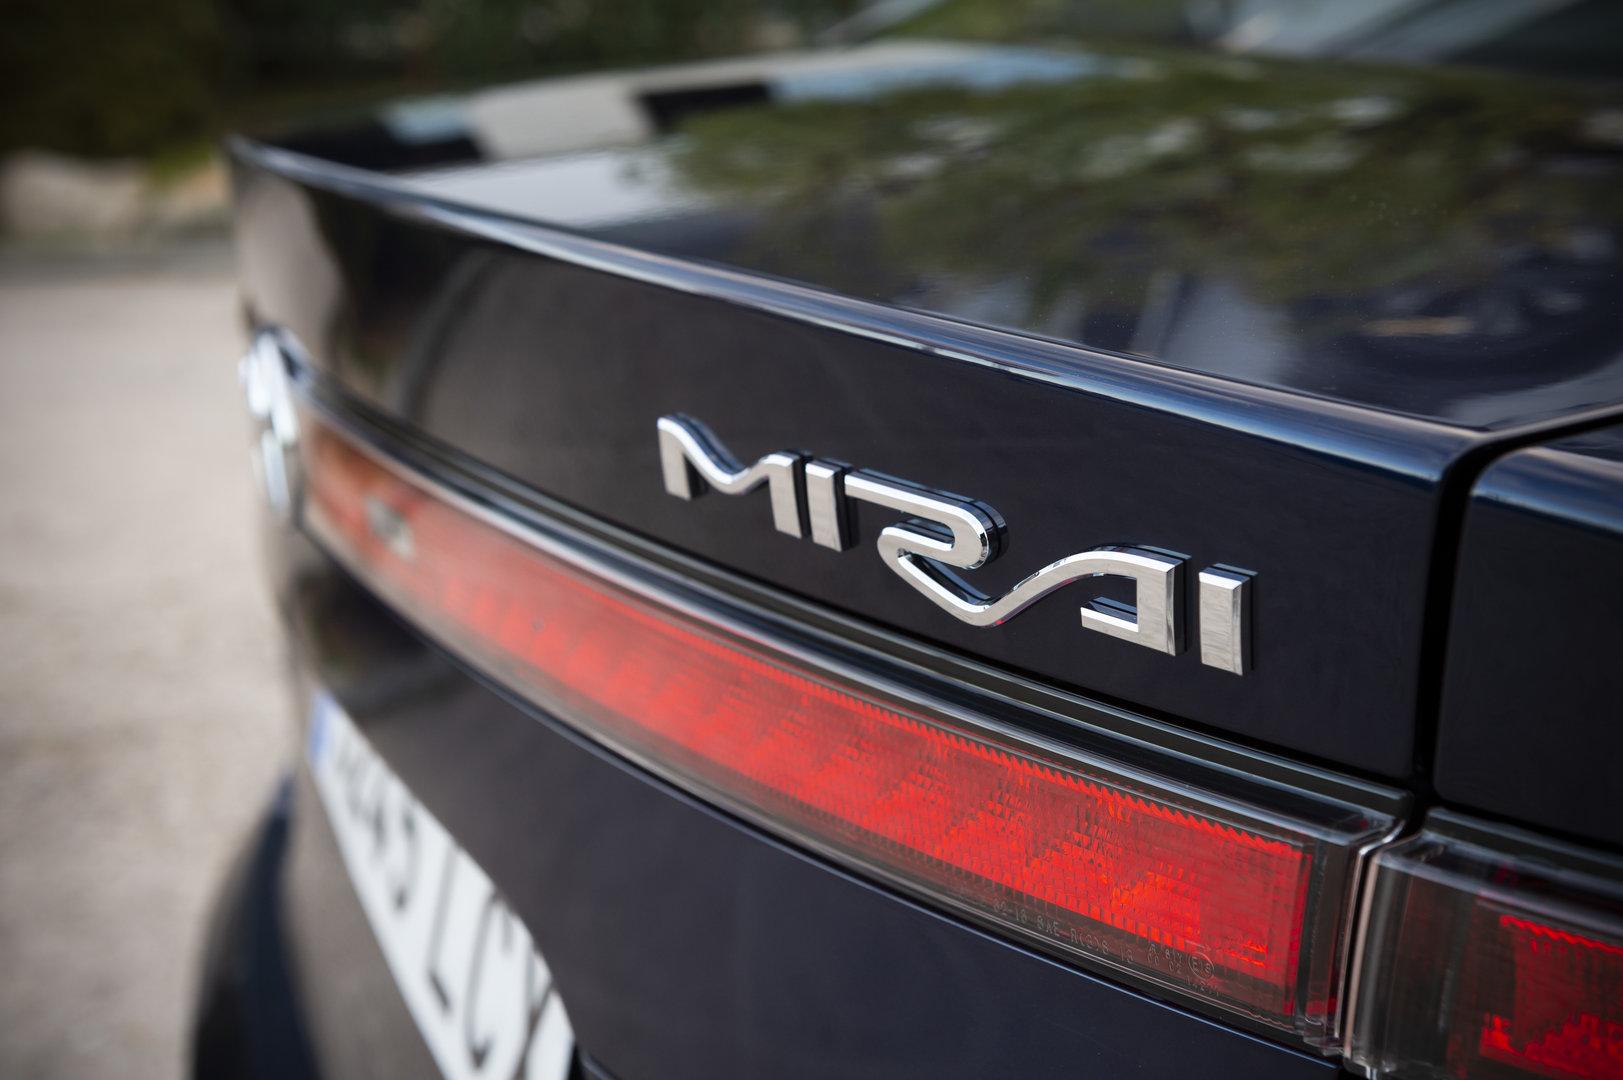 Toyota Mirai 3245 LCX 3